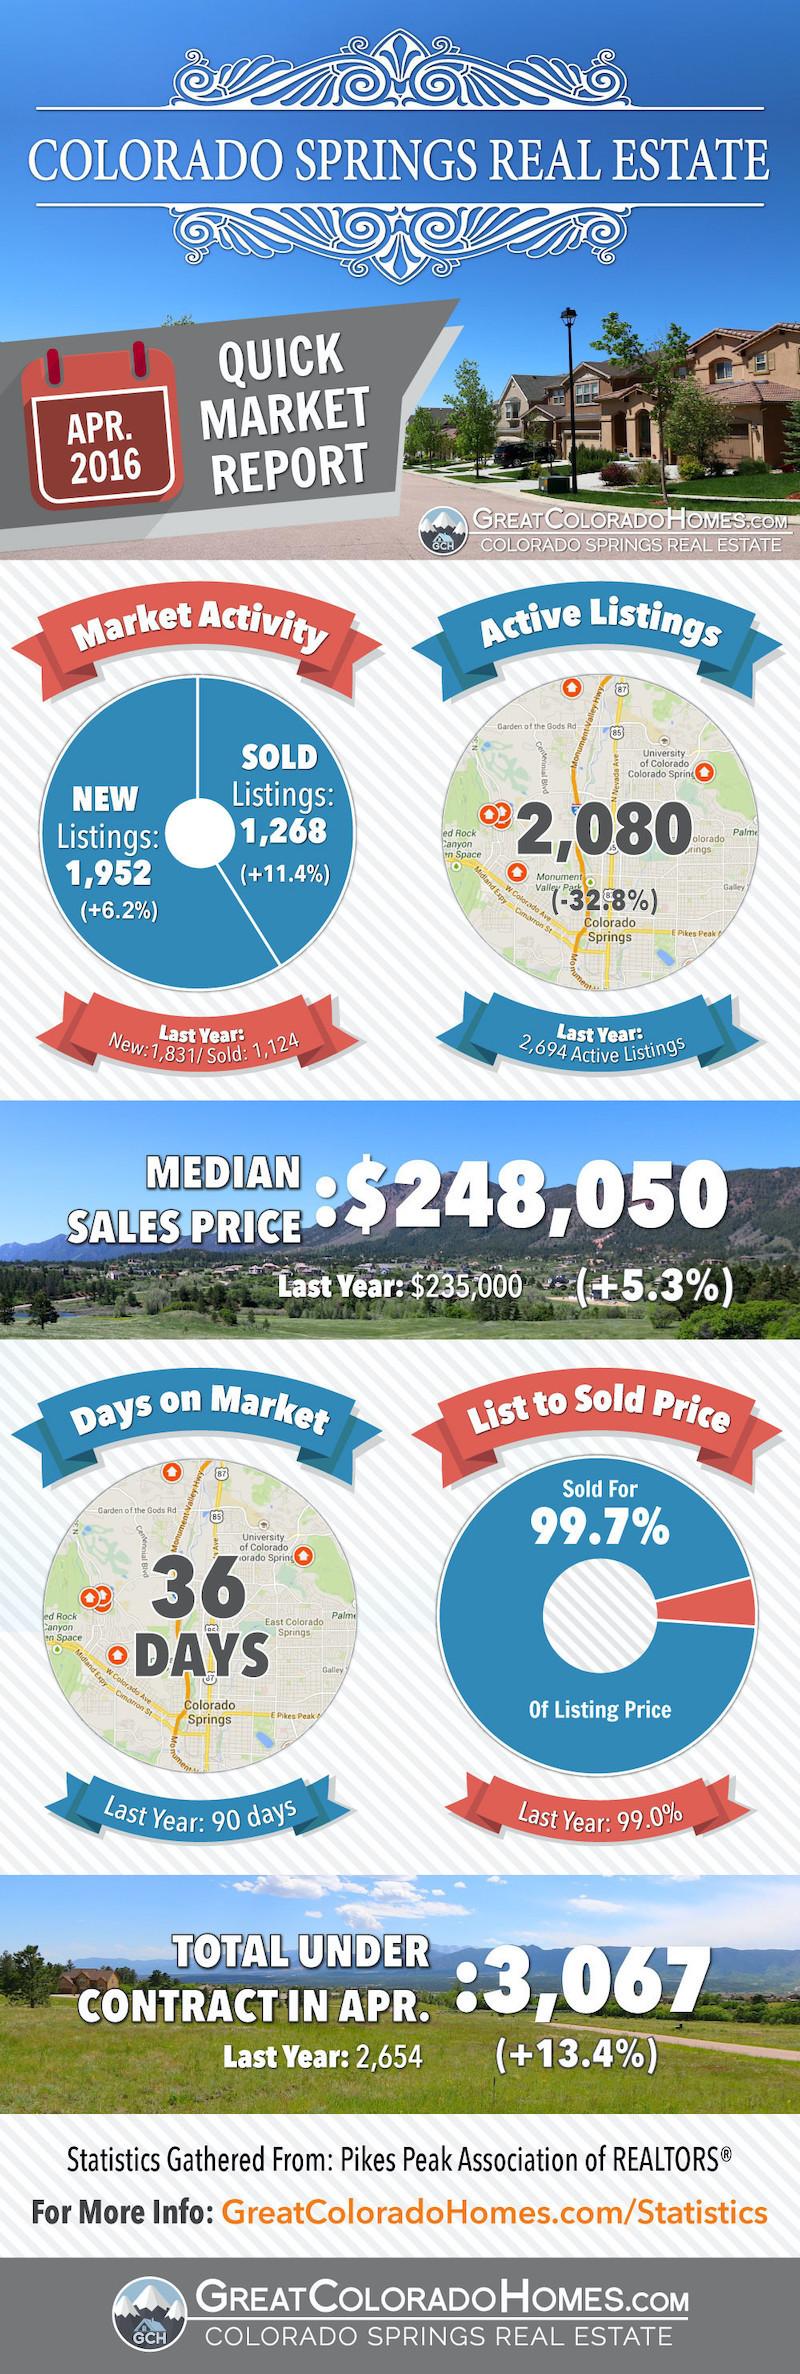 April 2016 Colorado Springs Real Estate Market Report